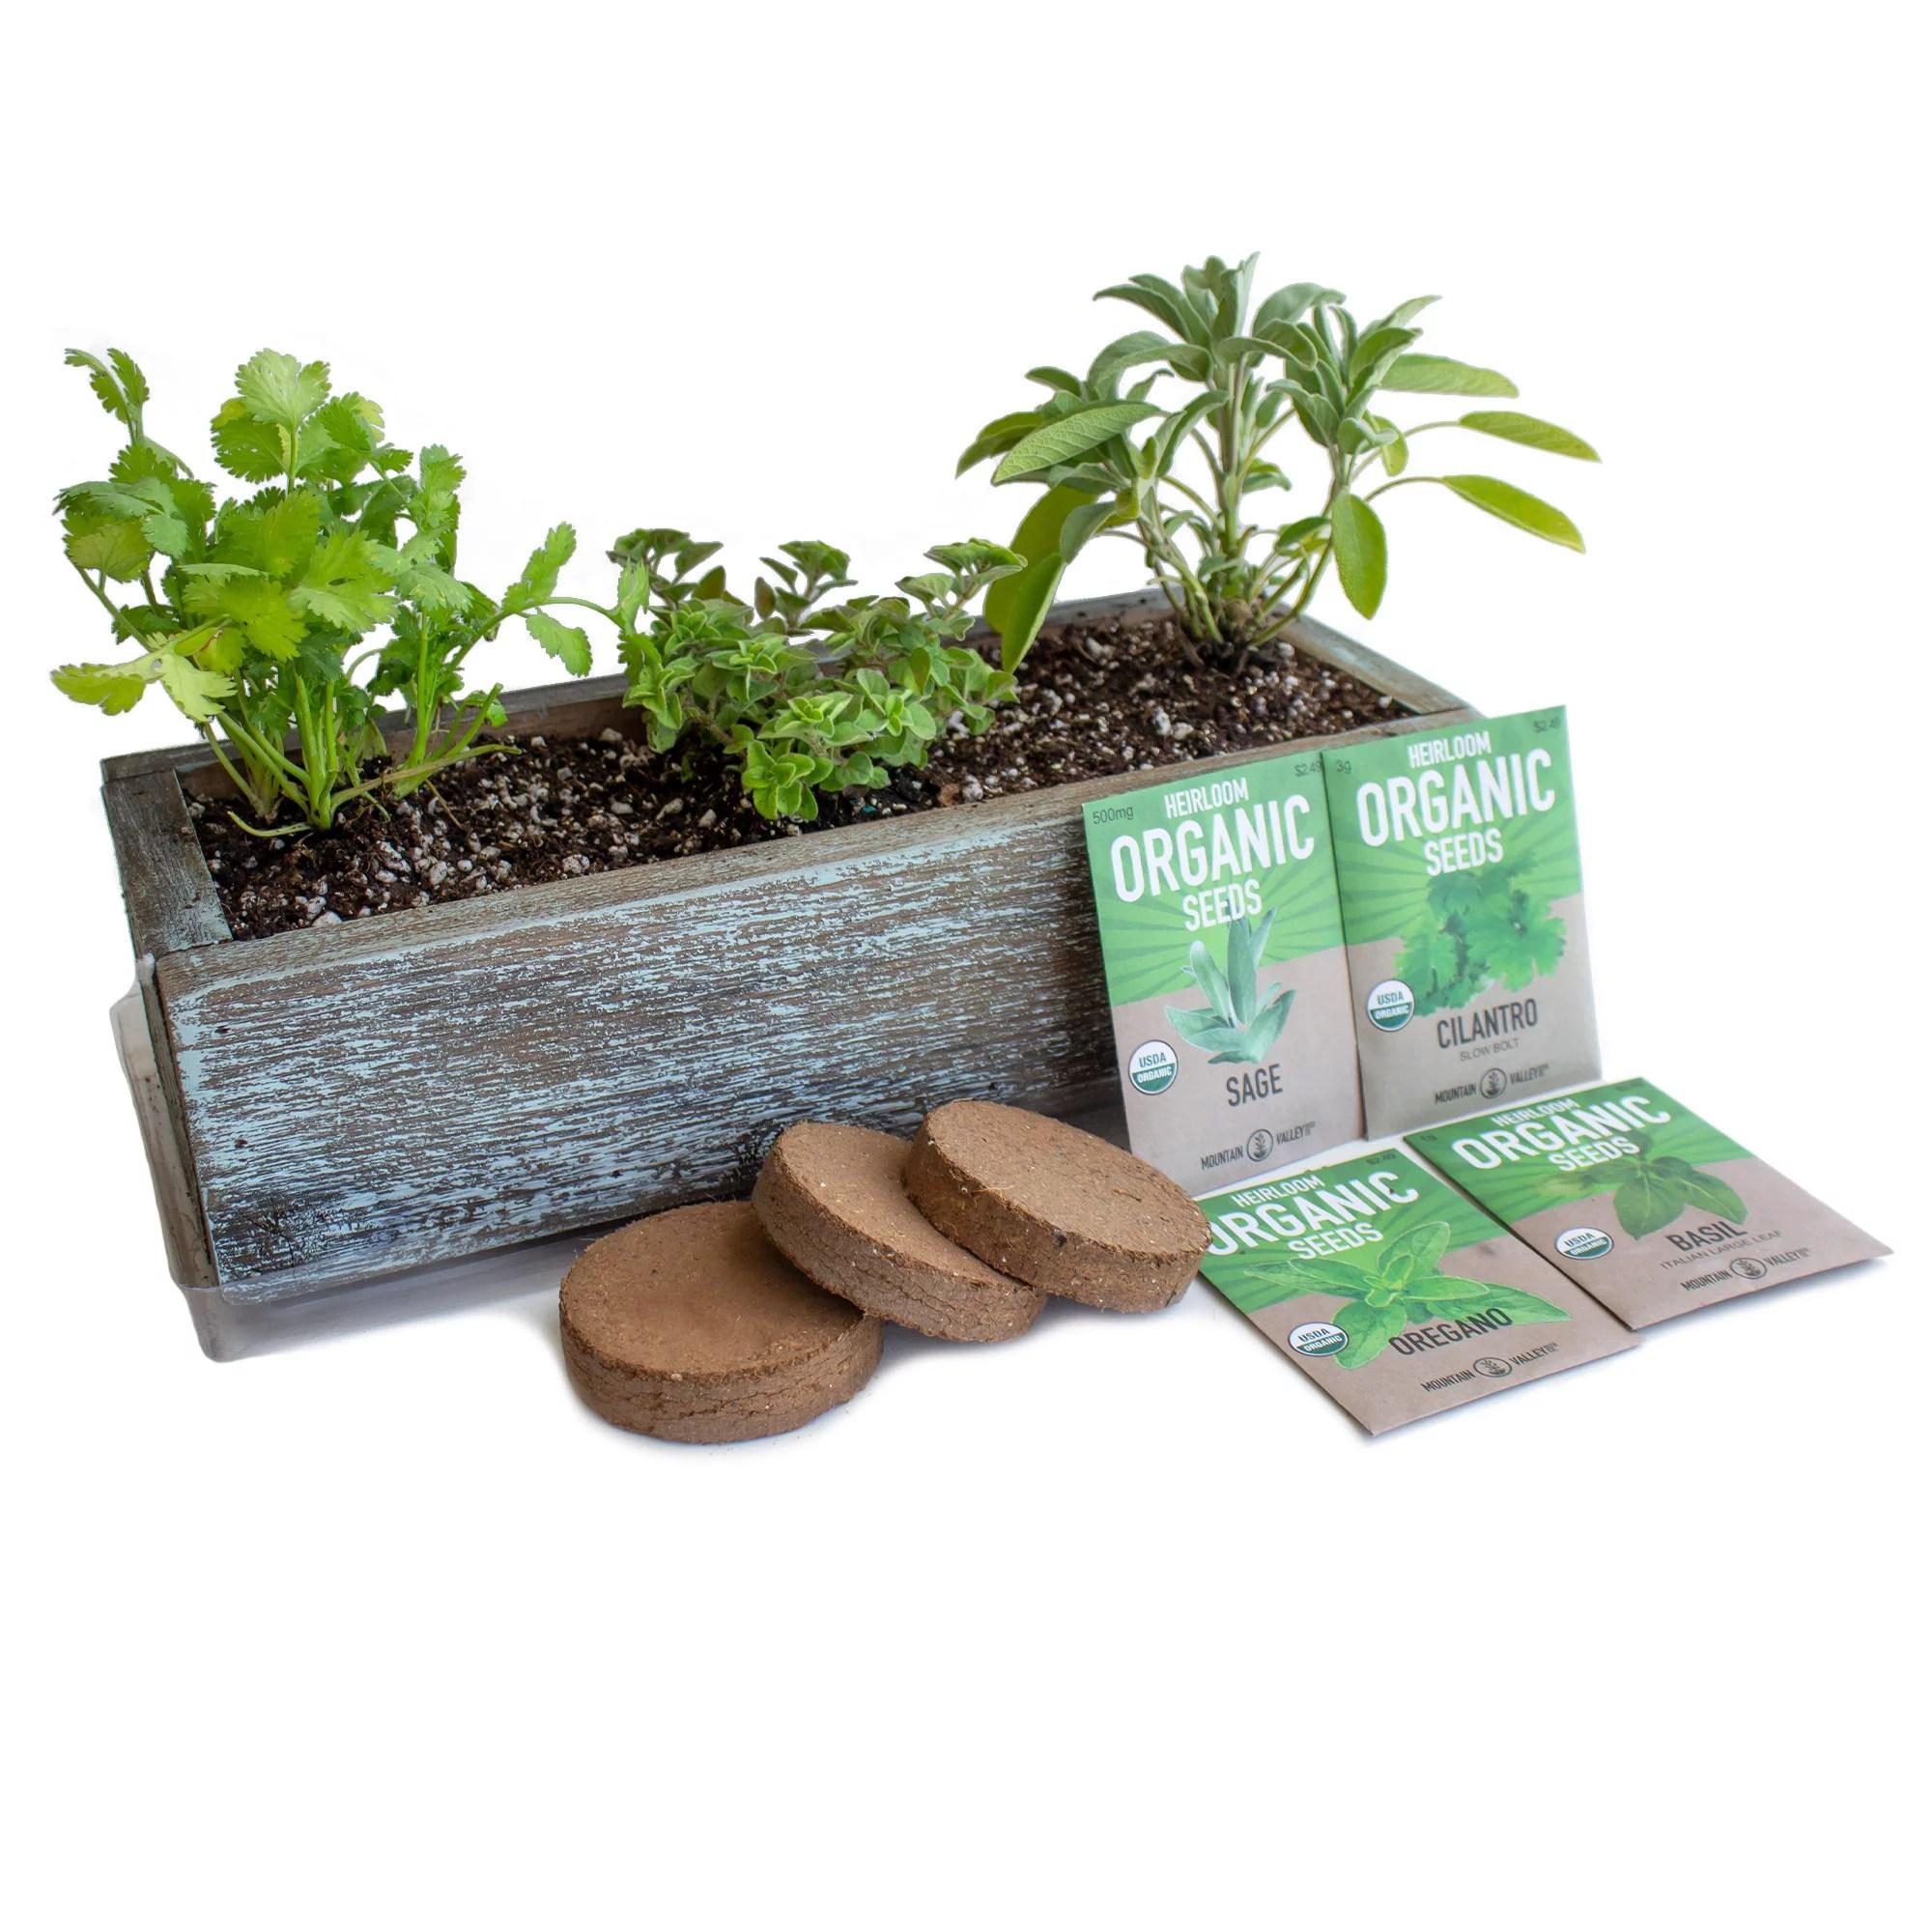 Culinary Herb Garden Kit With Reclaimed Barnwood Style Planter Aged Brown Grow Cooking Herbs Non Gmo Organic Seeds Basil Cilantro Oregano Sage Windowsill Herb Gardening Walmart Com Walmart Com